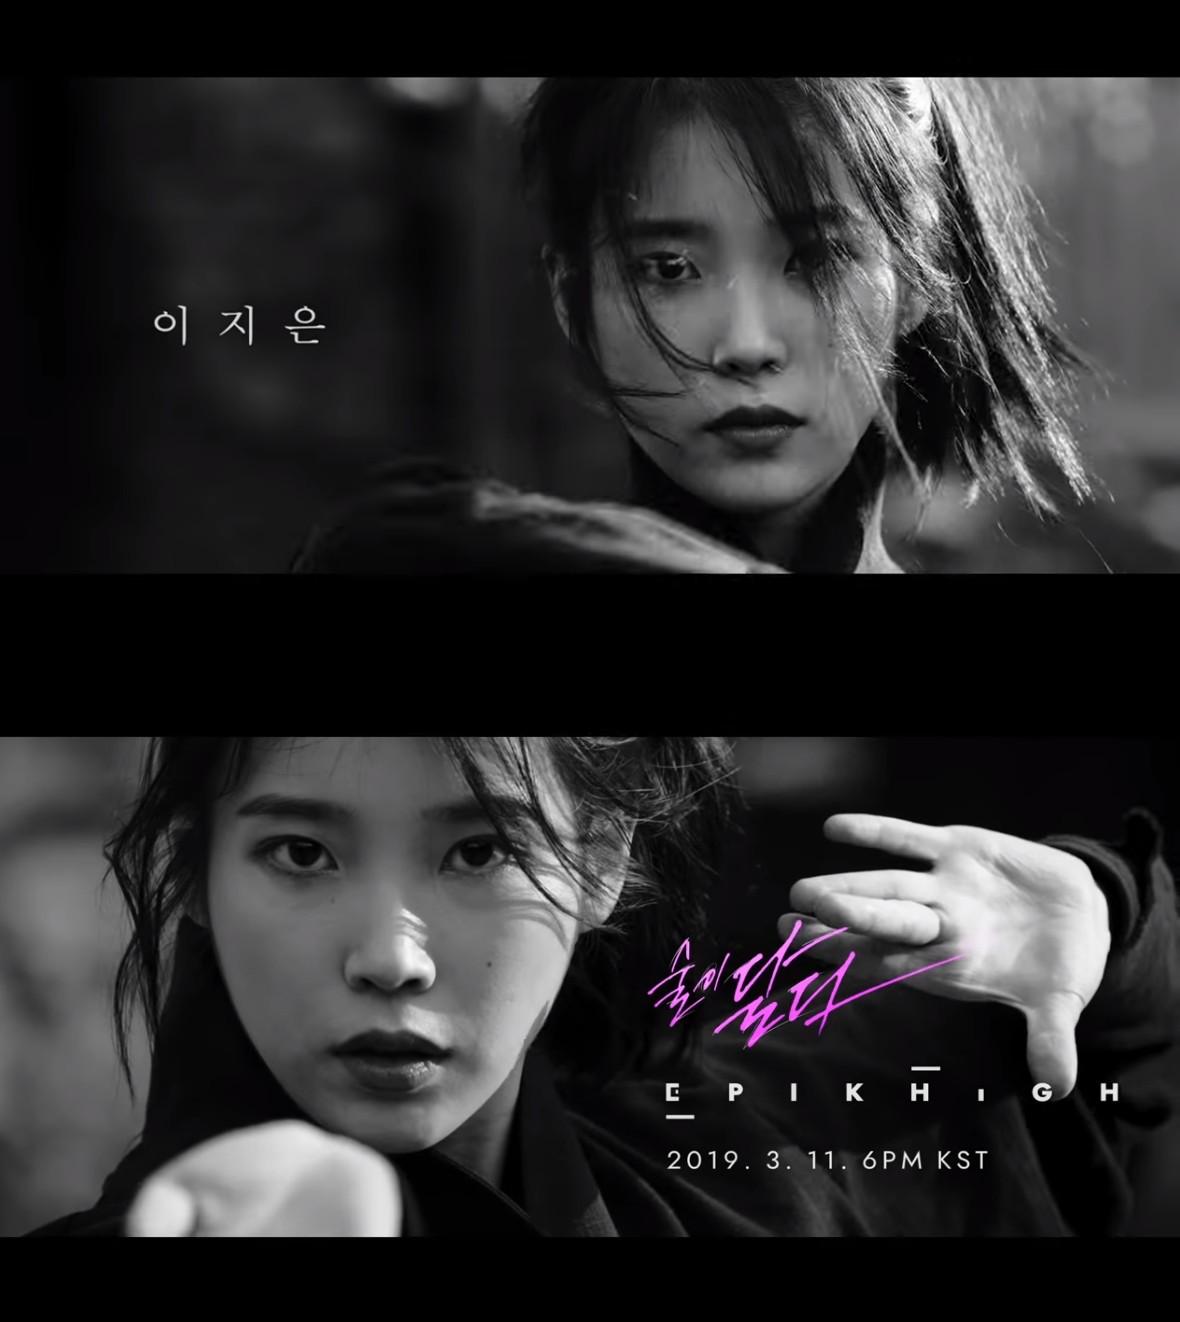 ▲IU在MV預告中化身武打高手。(圖/翻攝自OFFICIAL EPIK HIGH YOUTUBE)